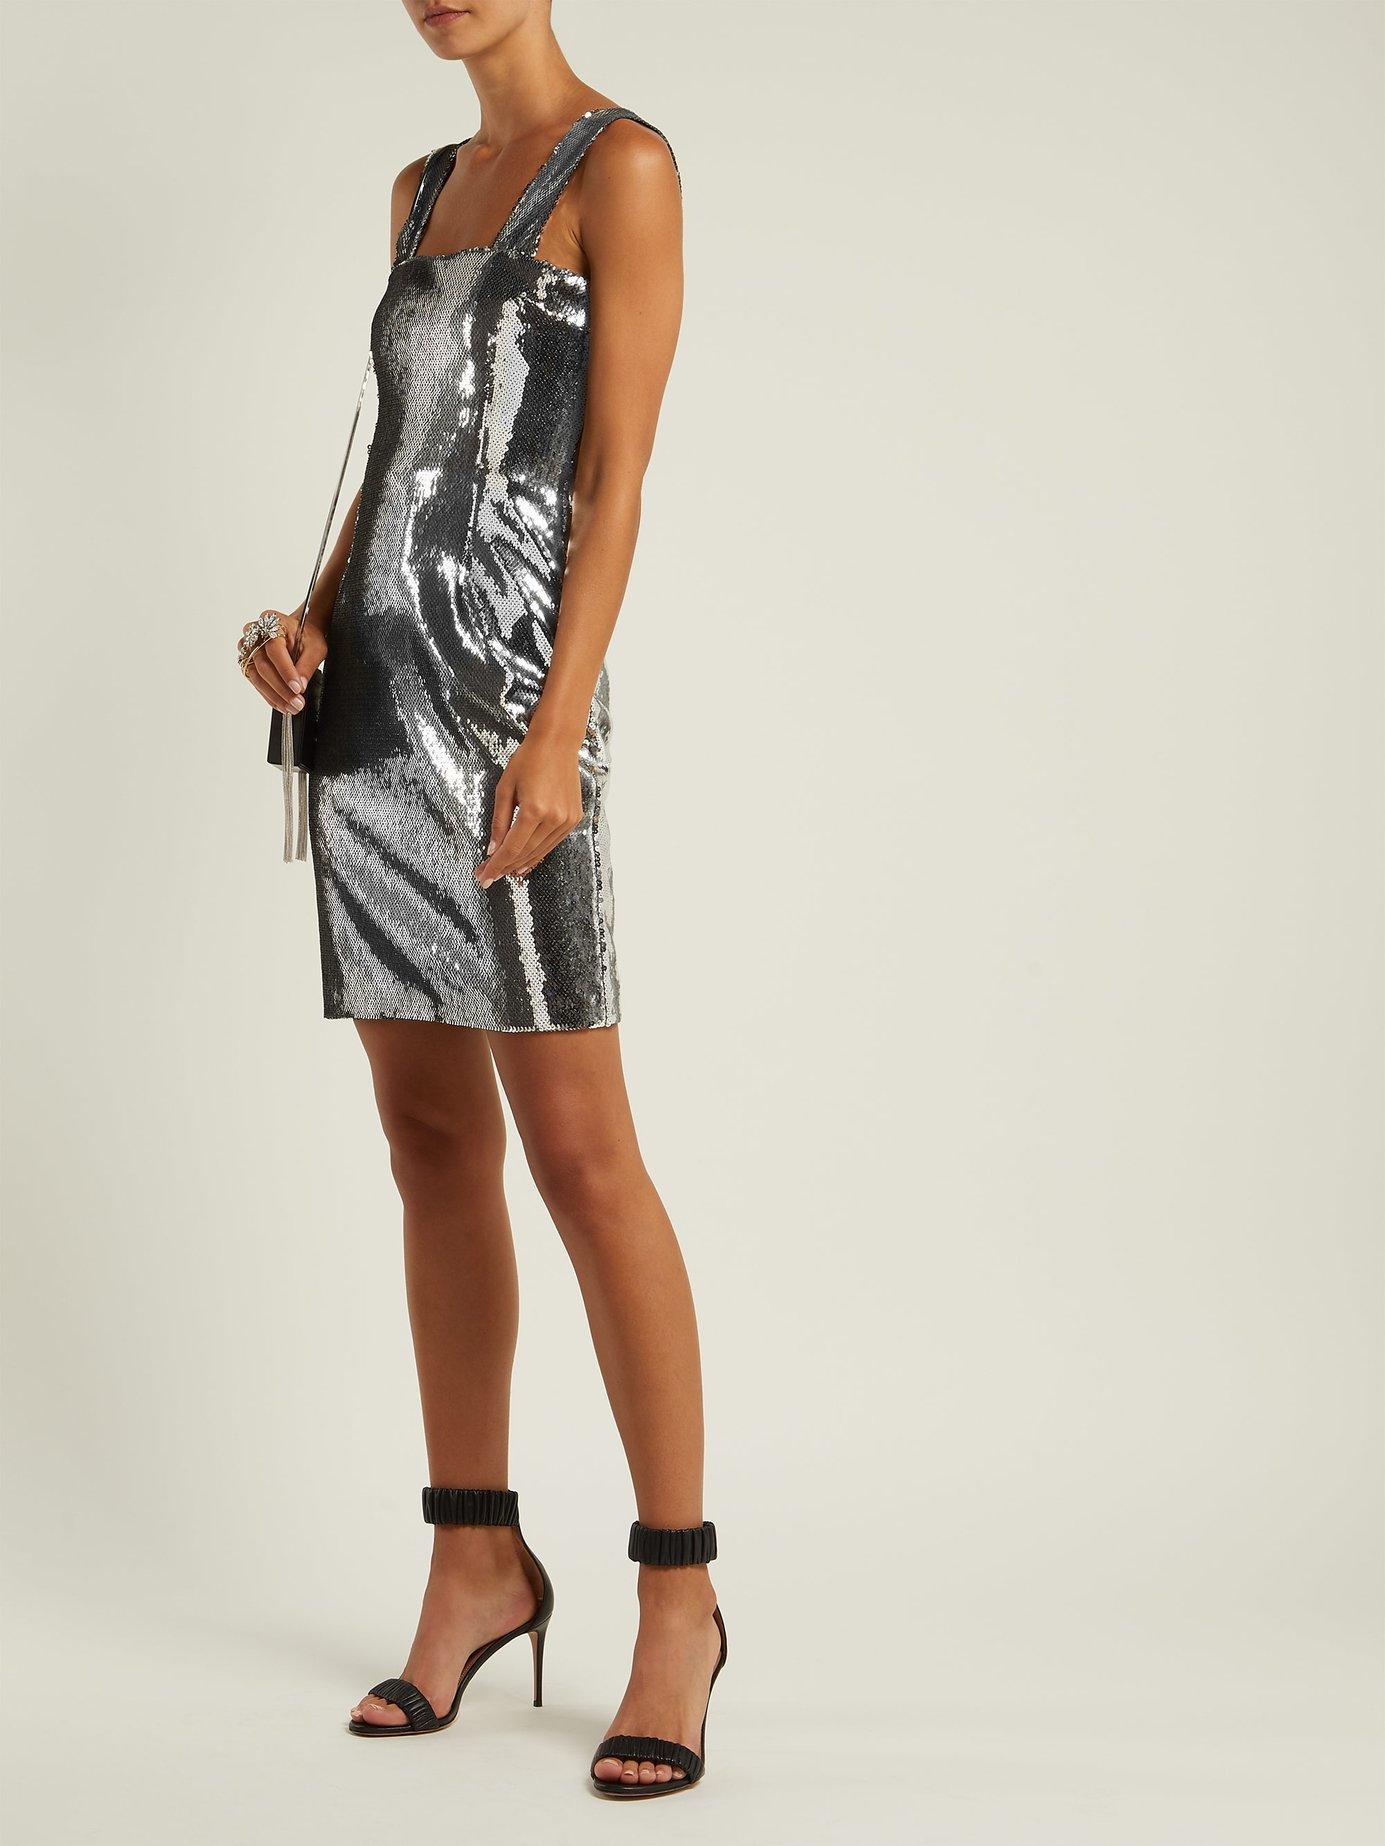 Sequined square-neckline dress by Galvan